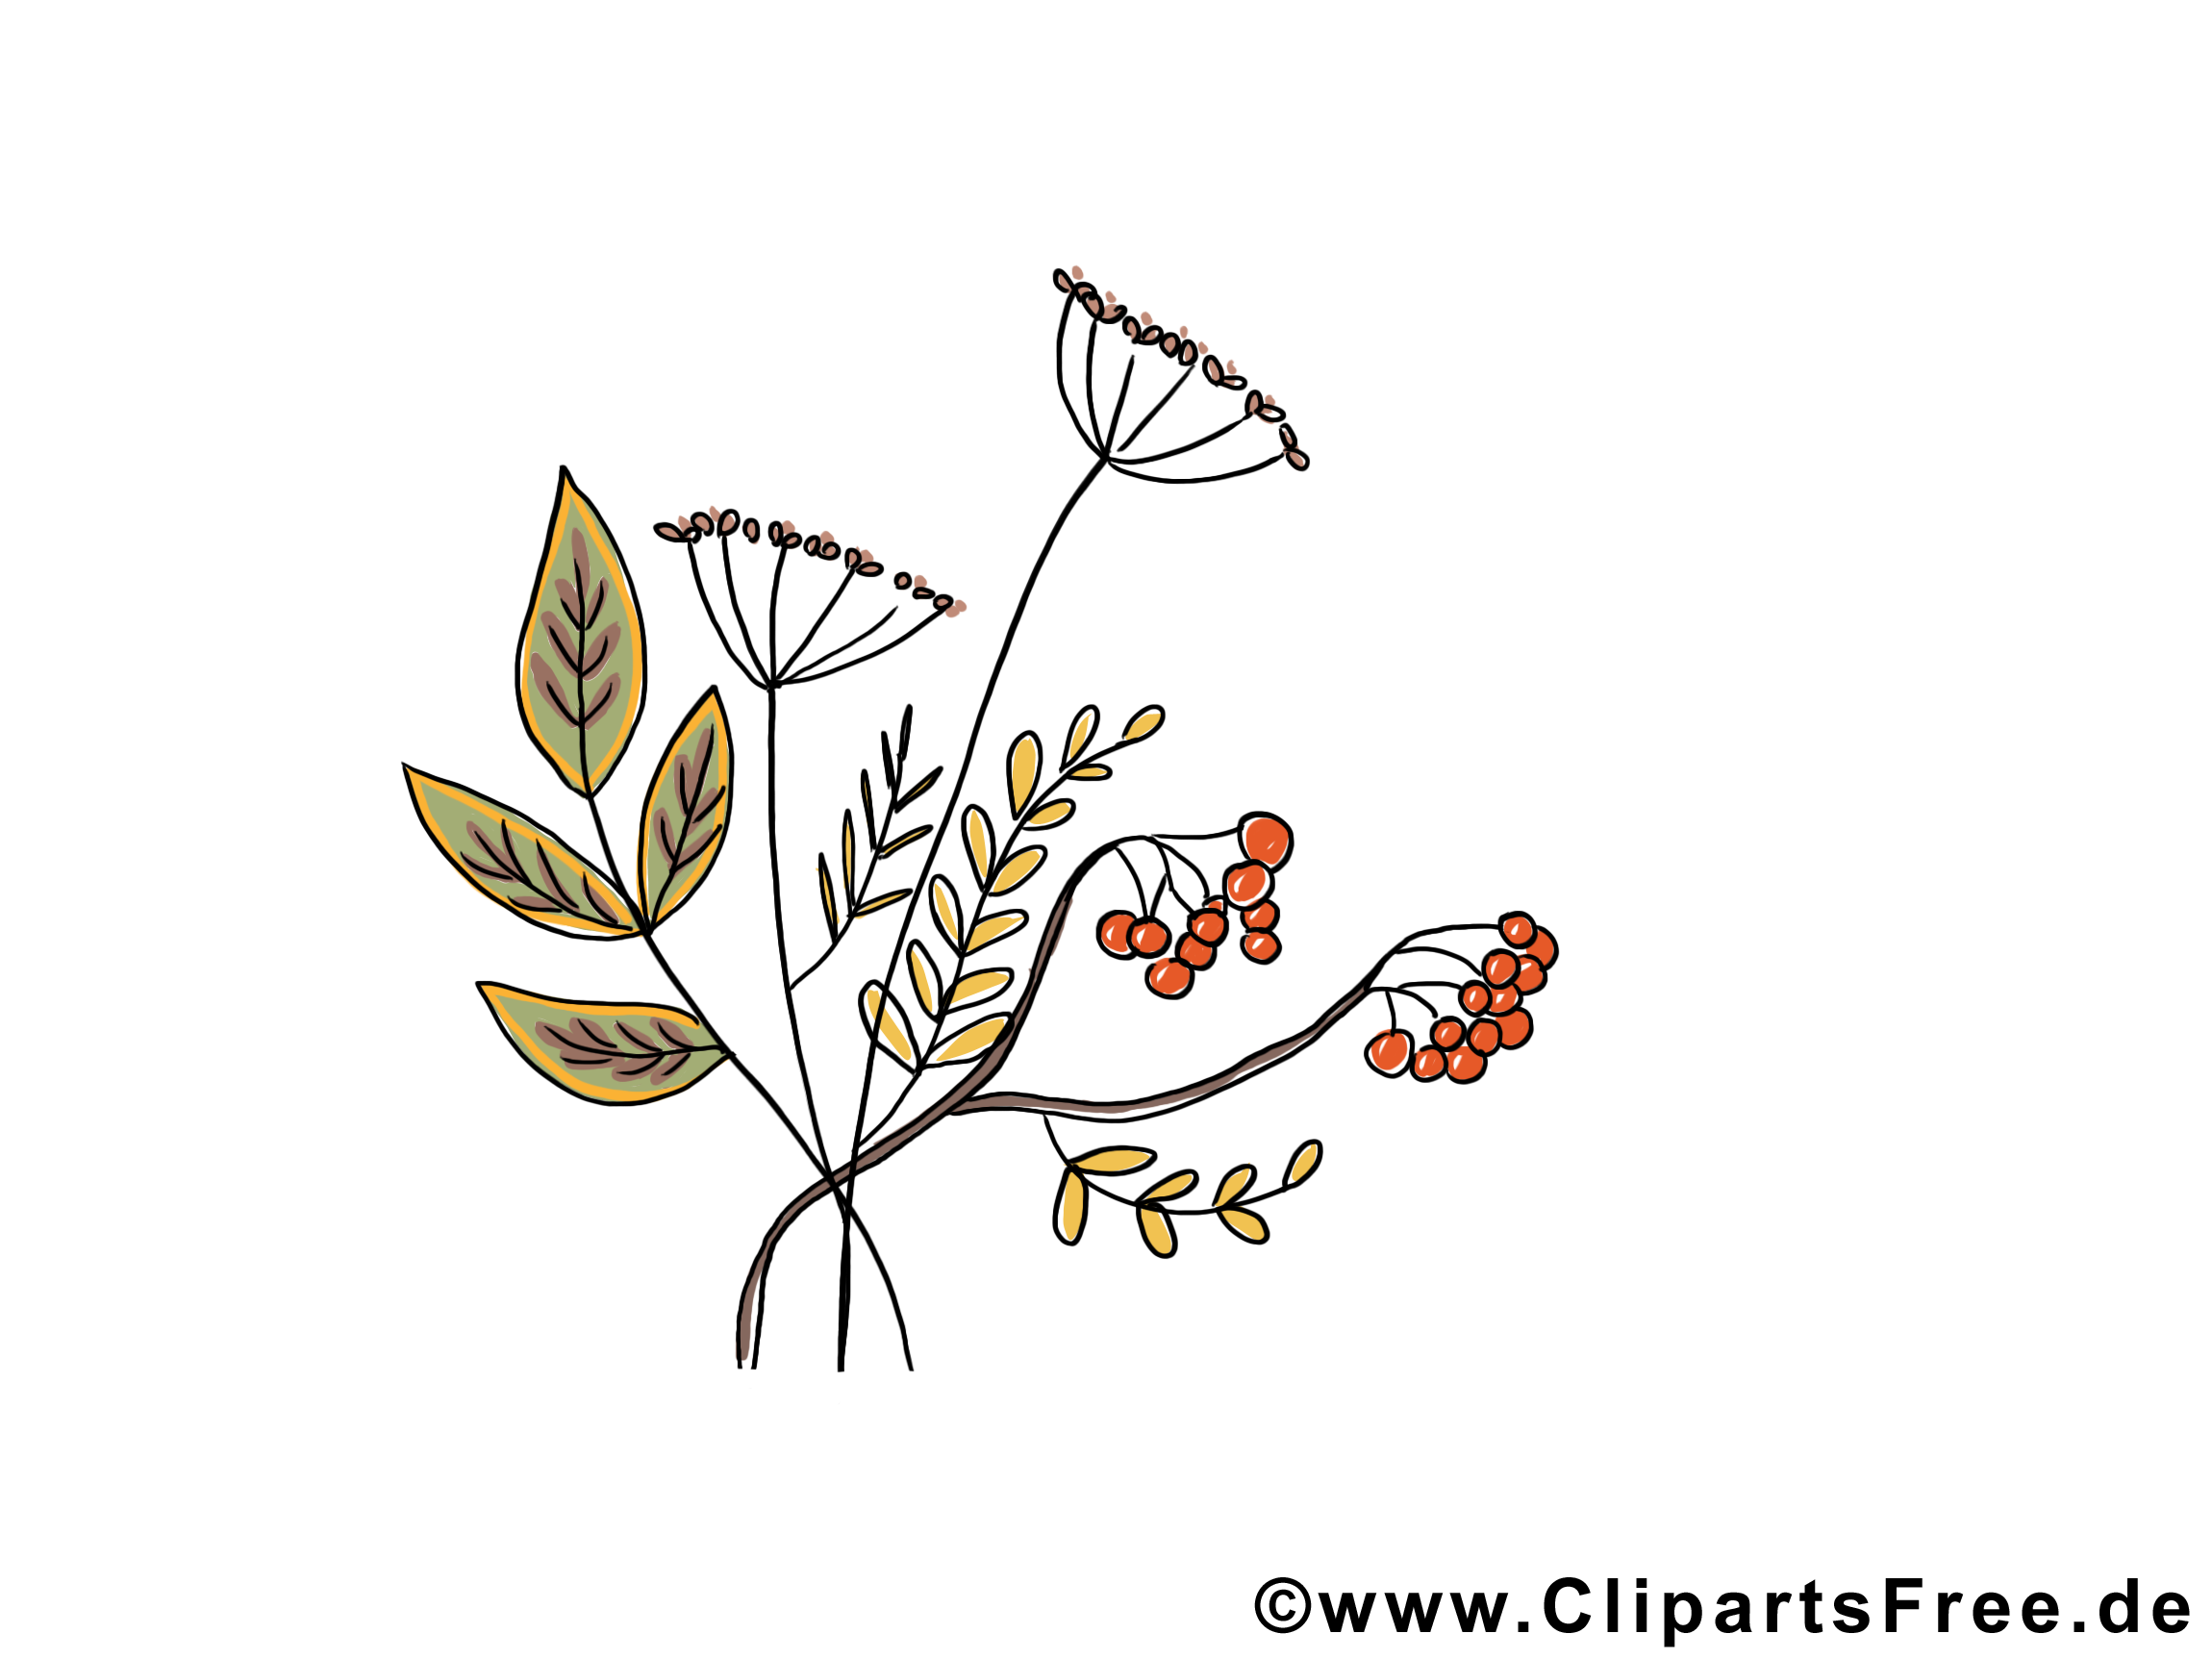 Sorbier image gratuite – Automne illustration